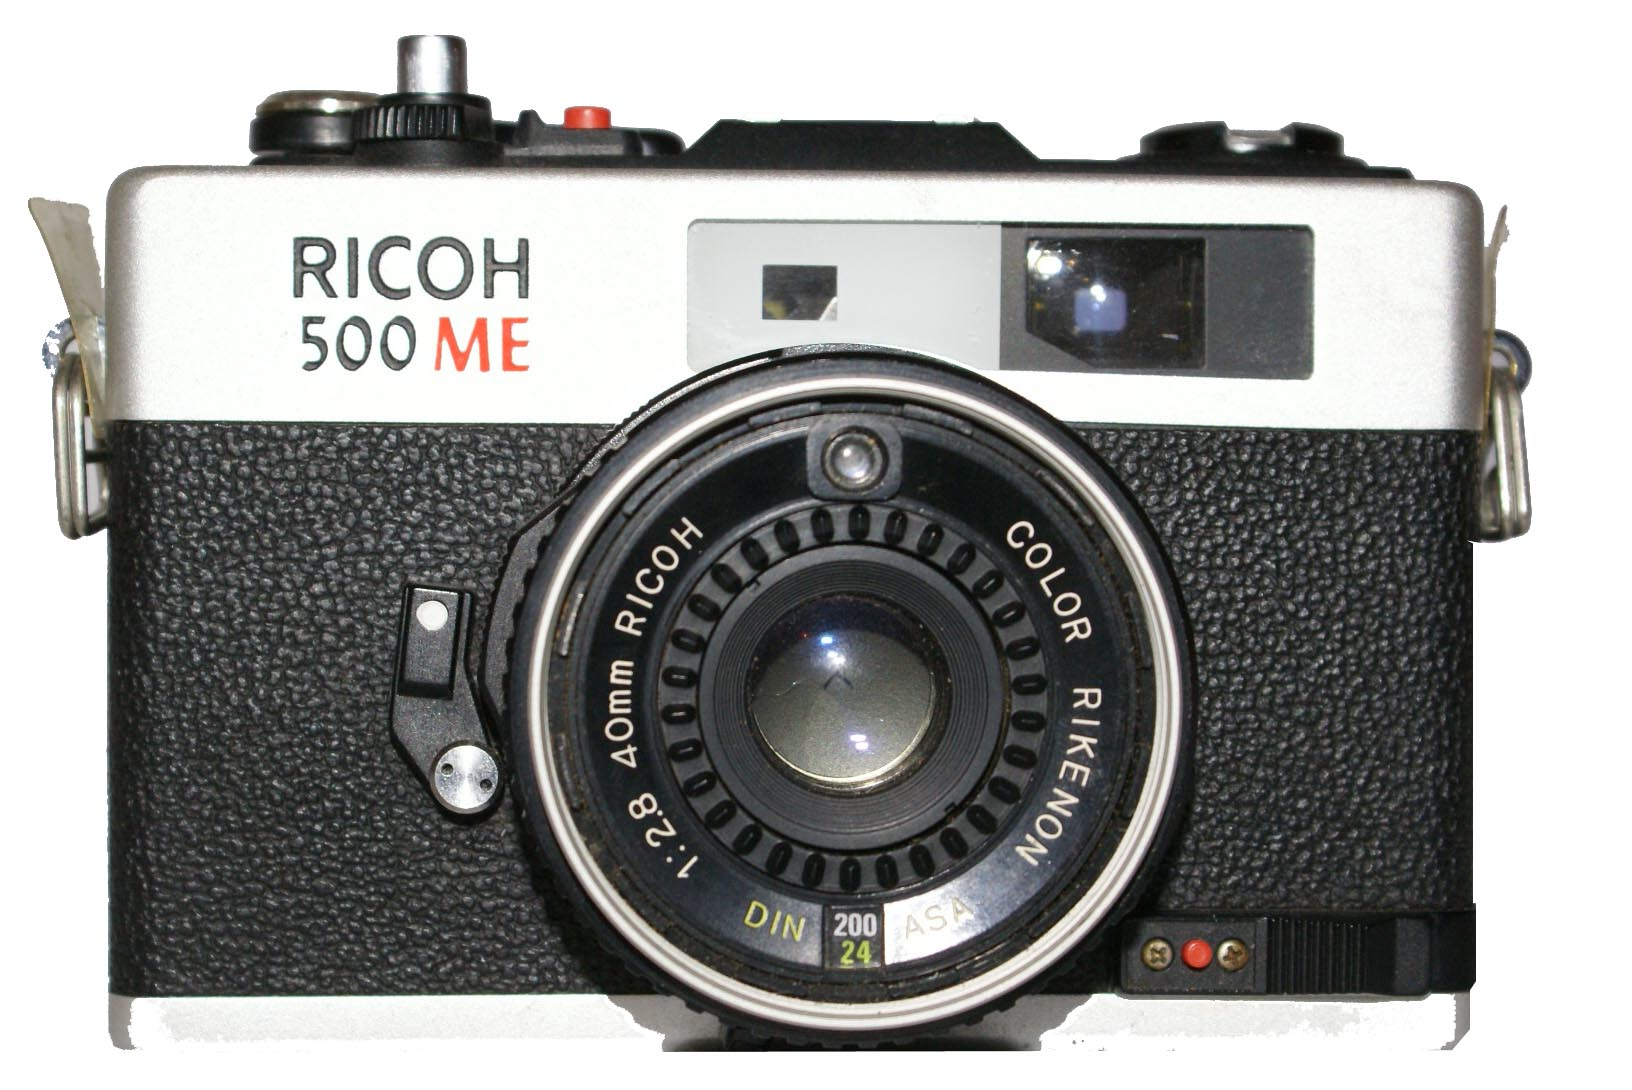 RICOH 500 ME